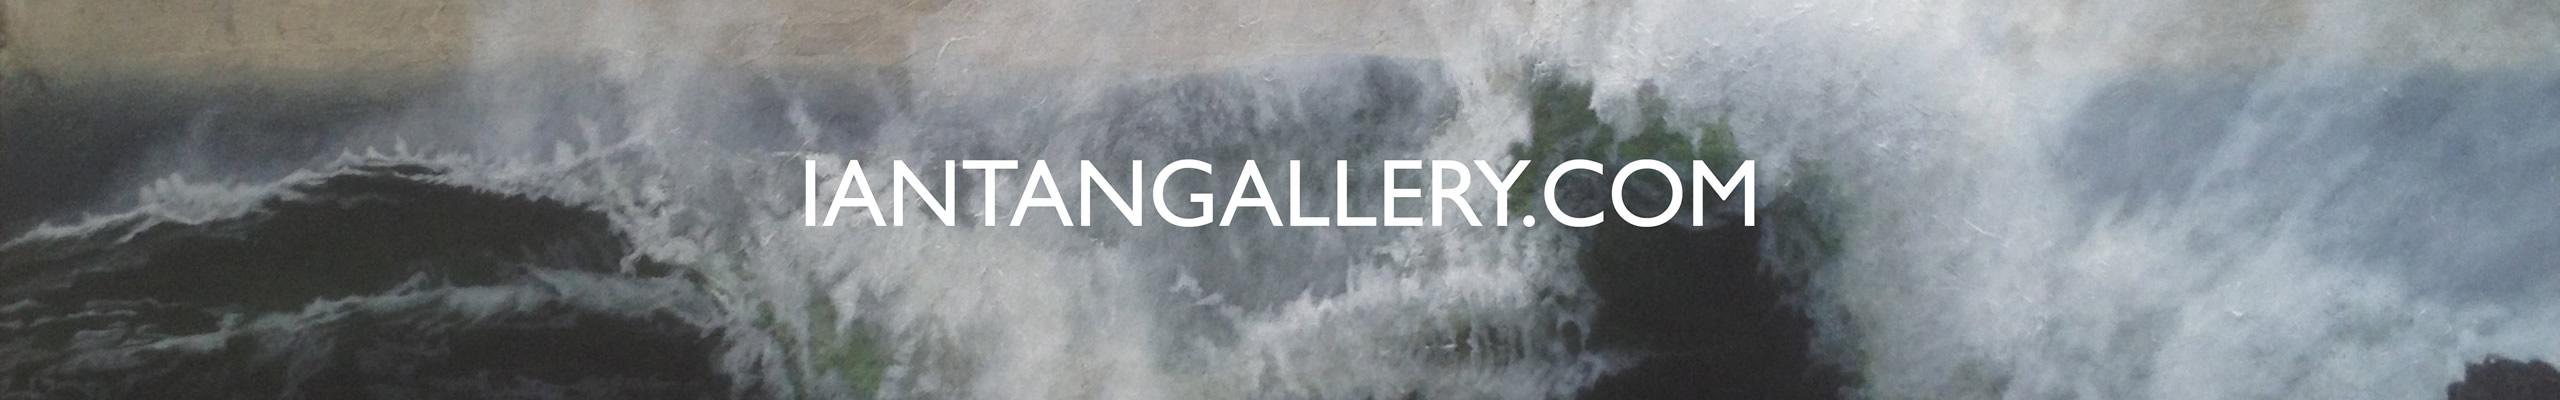 Best Online Art Galleries Ian Tan Gallery